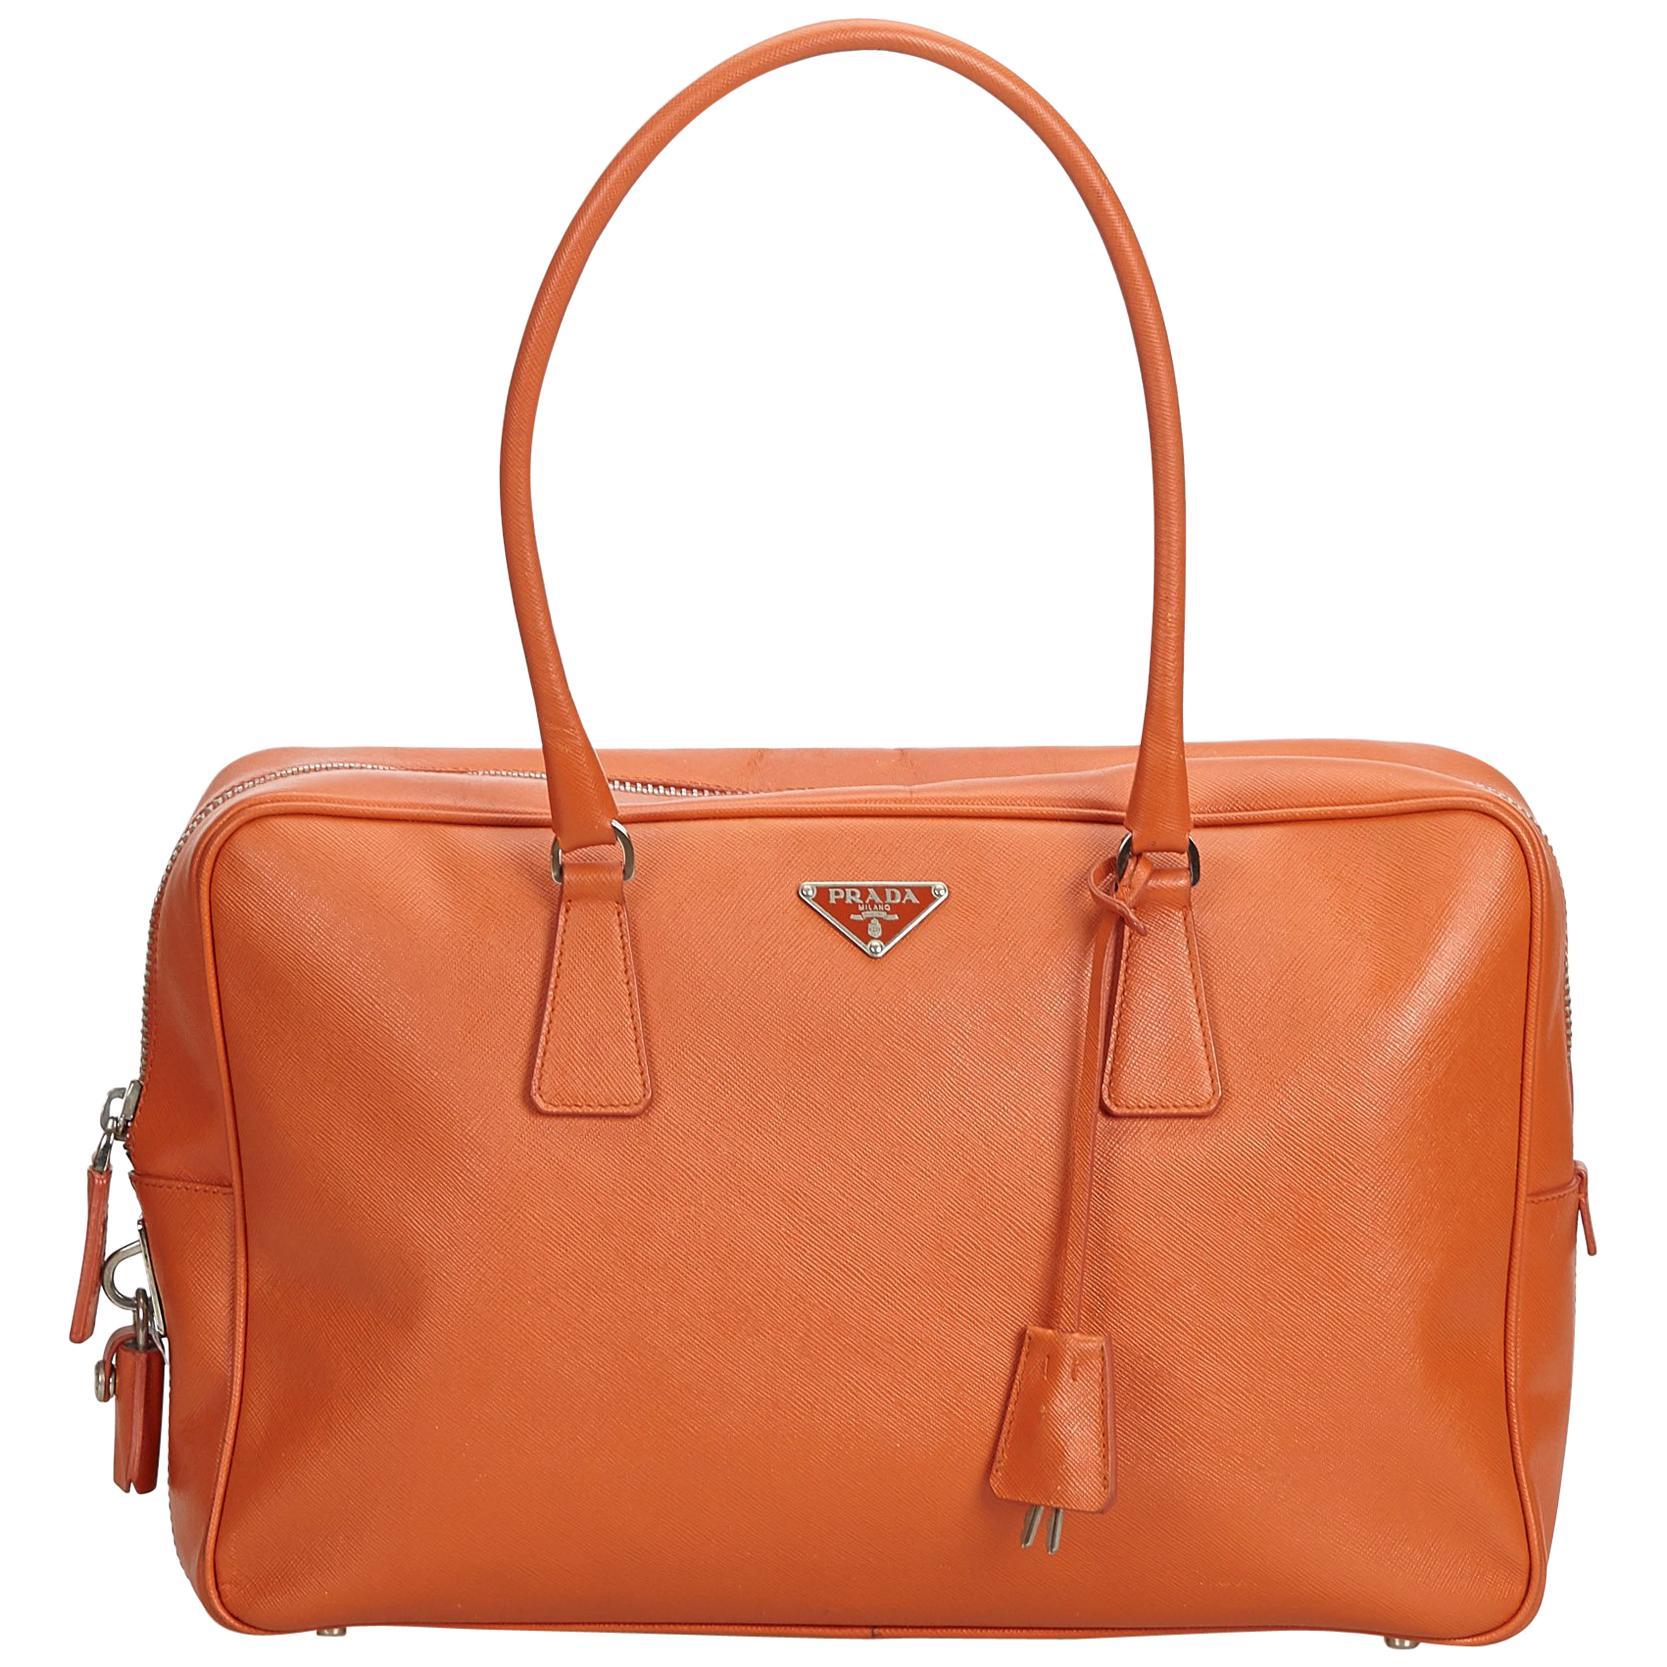 9a17c8bc8457 Prada Promenade Bag Saffiano Leather Small For Sale at 1stdibs